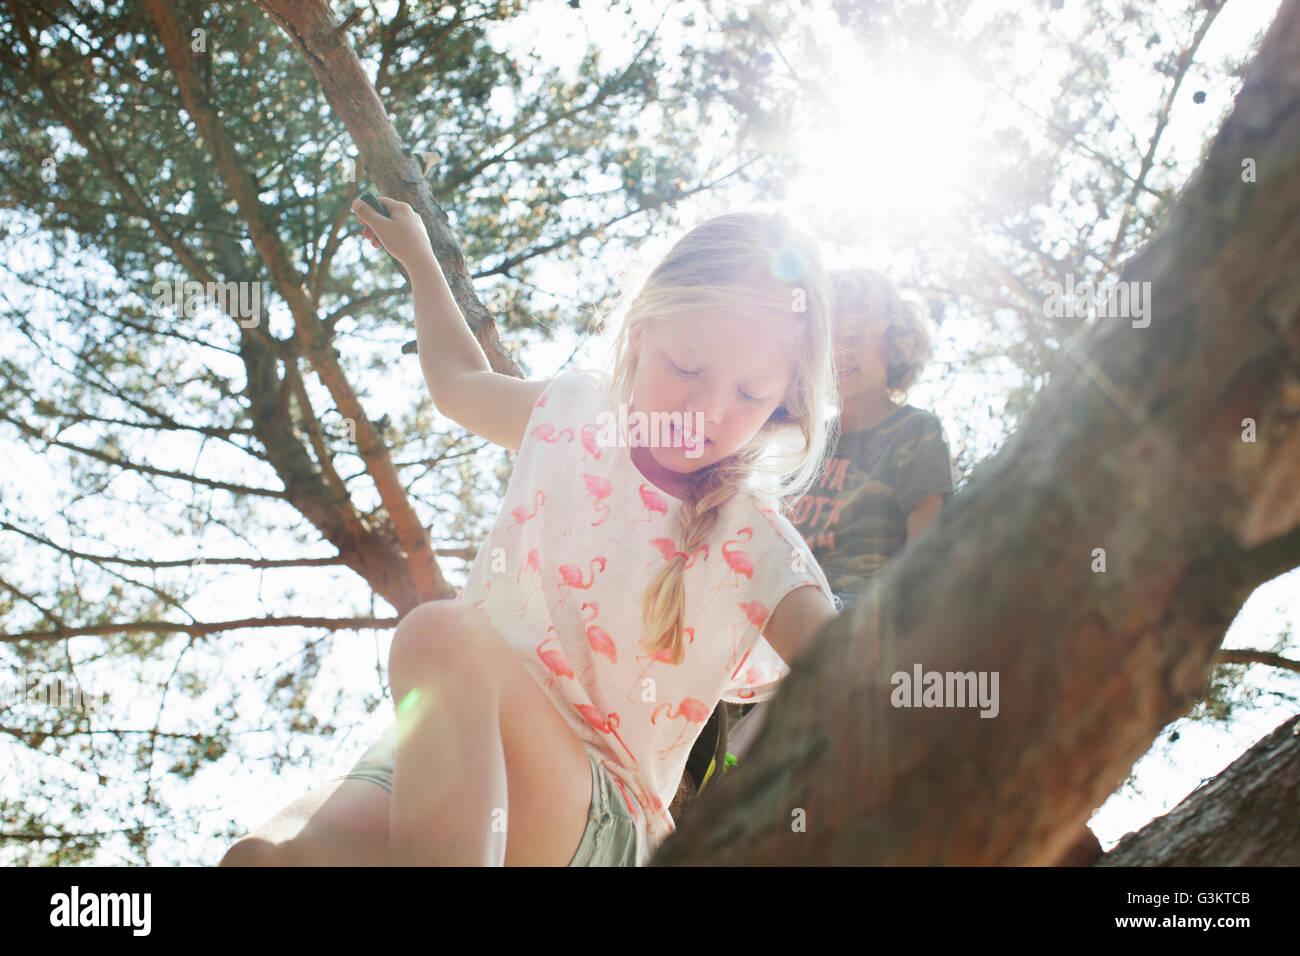 Boy and girl climbing tree - Stock Image